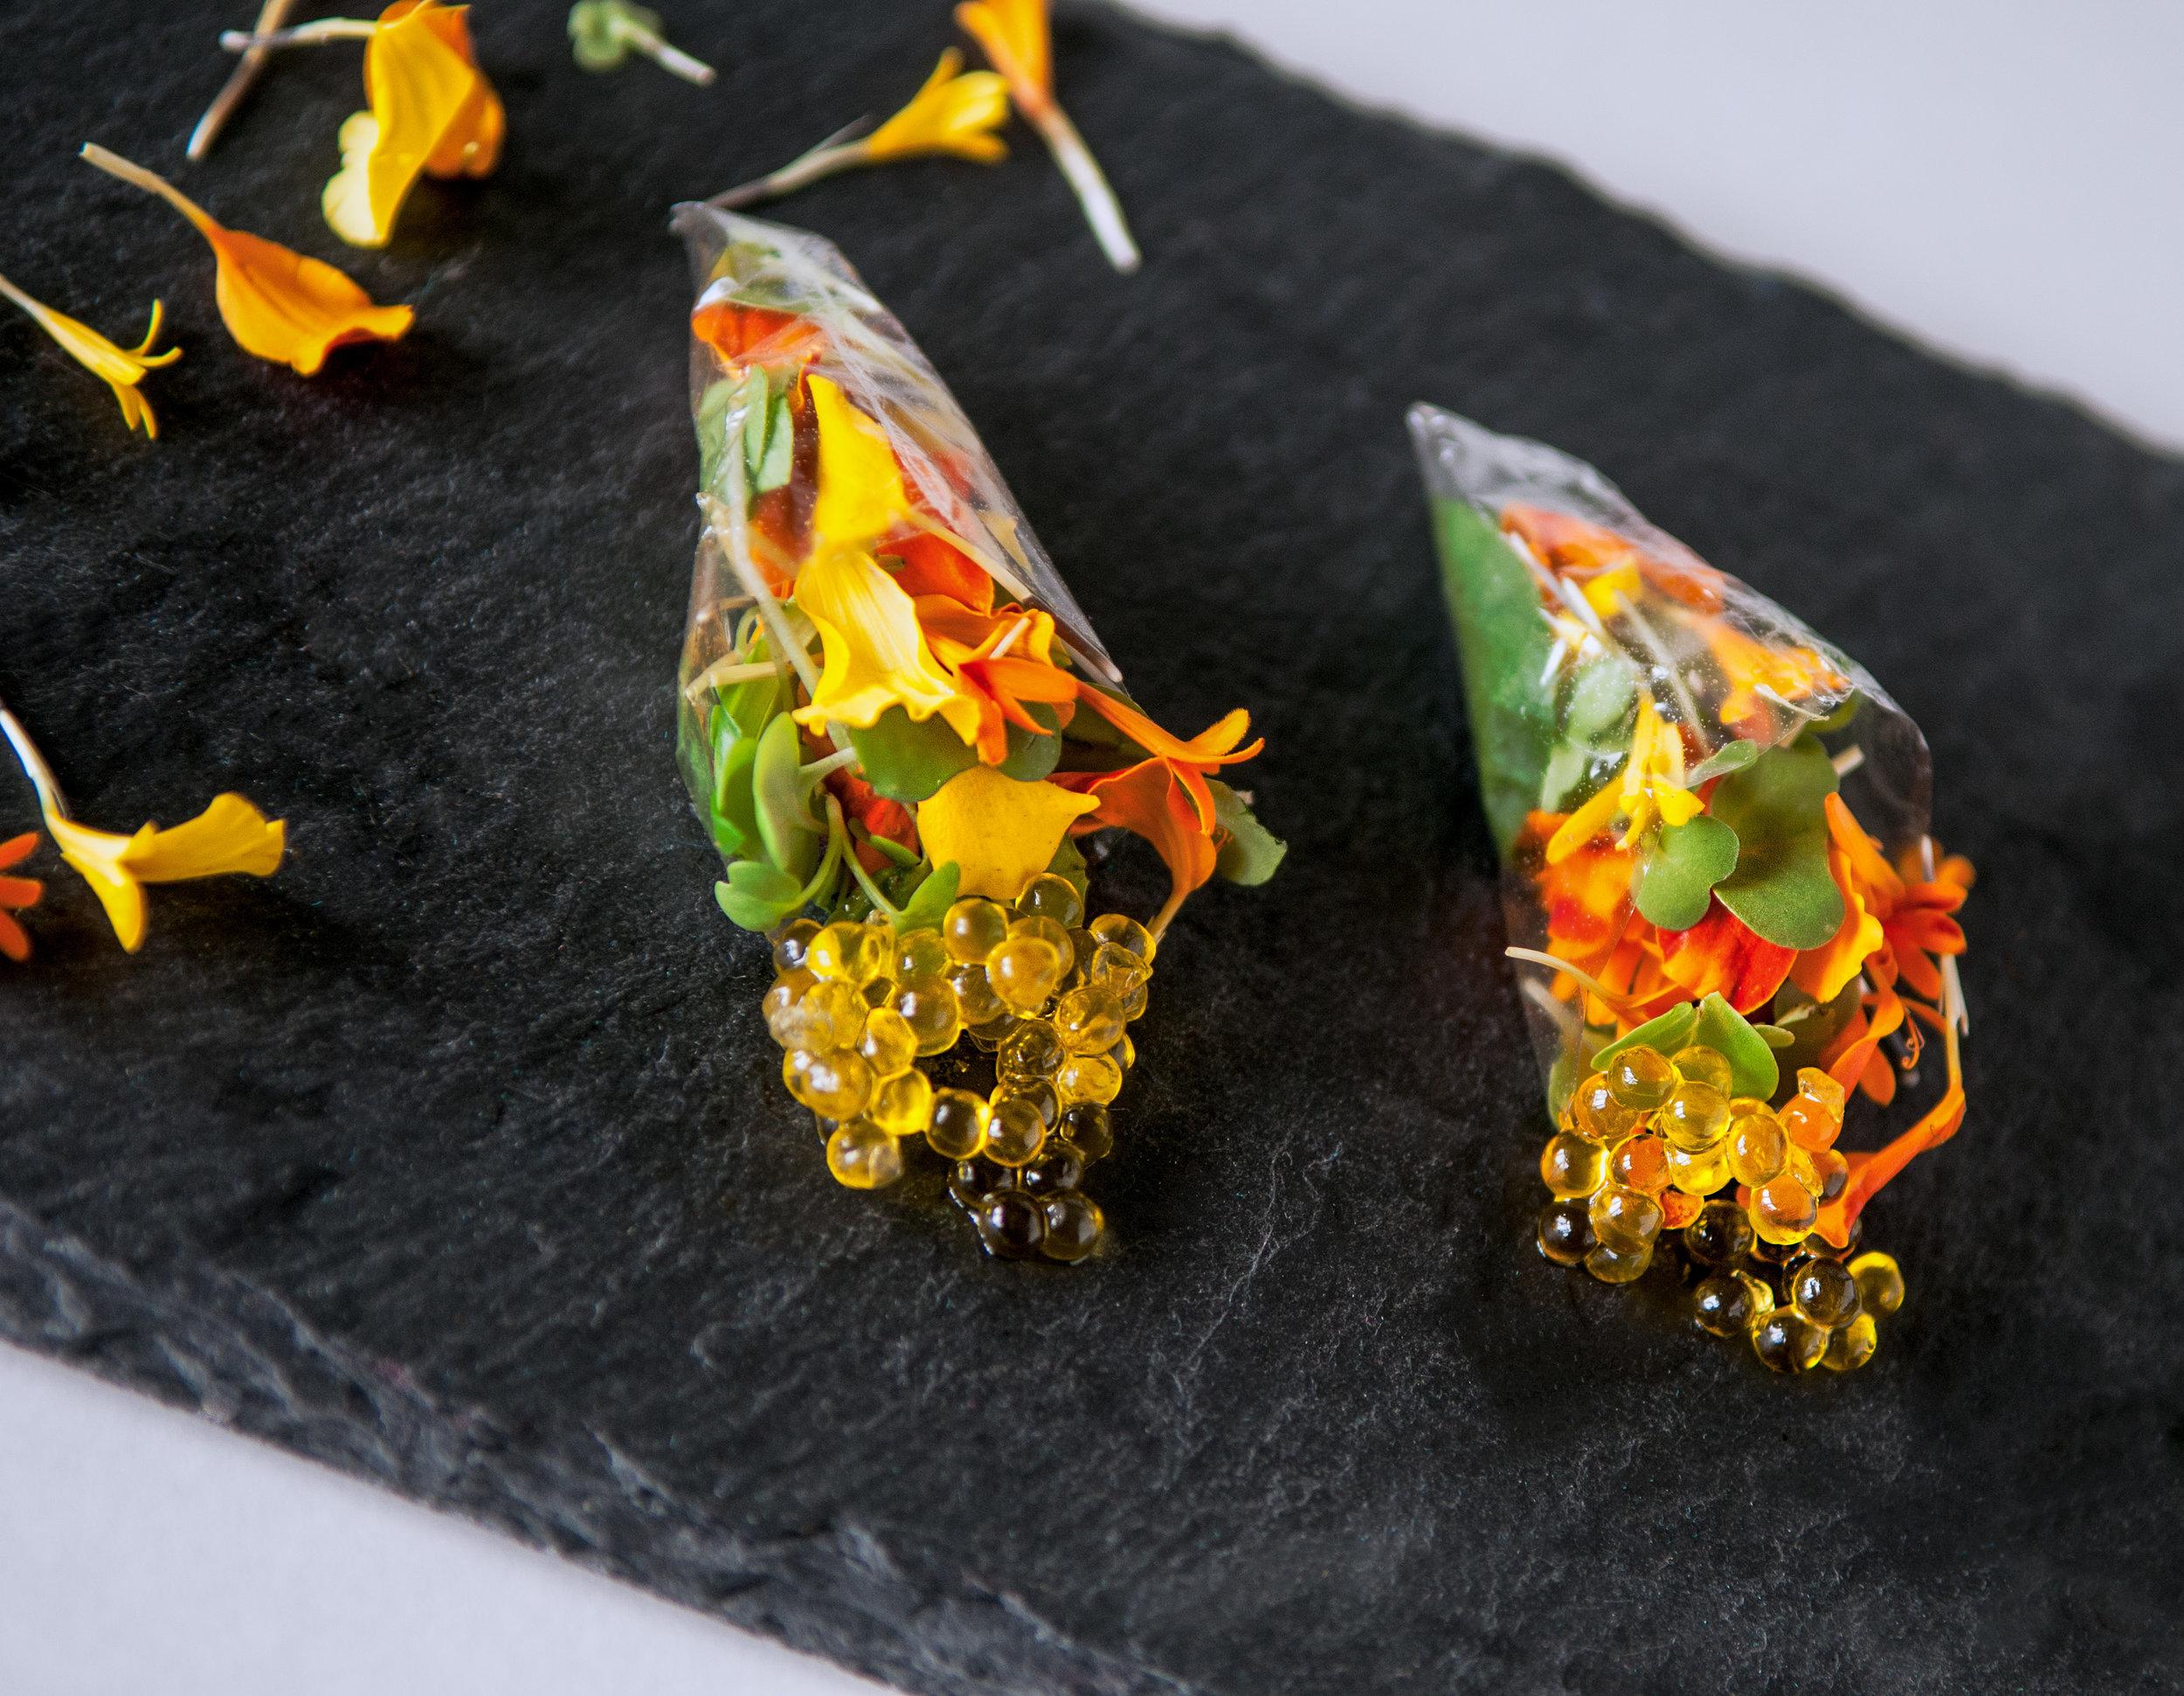 Edible Flower Salad + Olive Oil Caviar